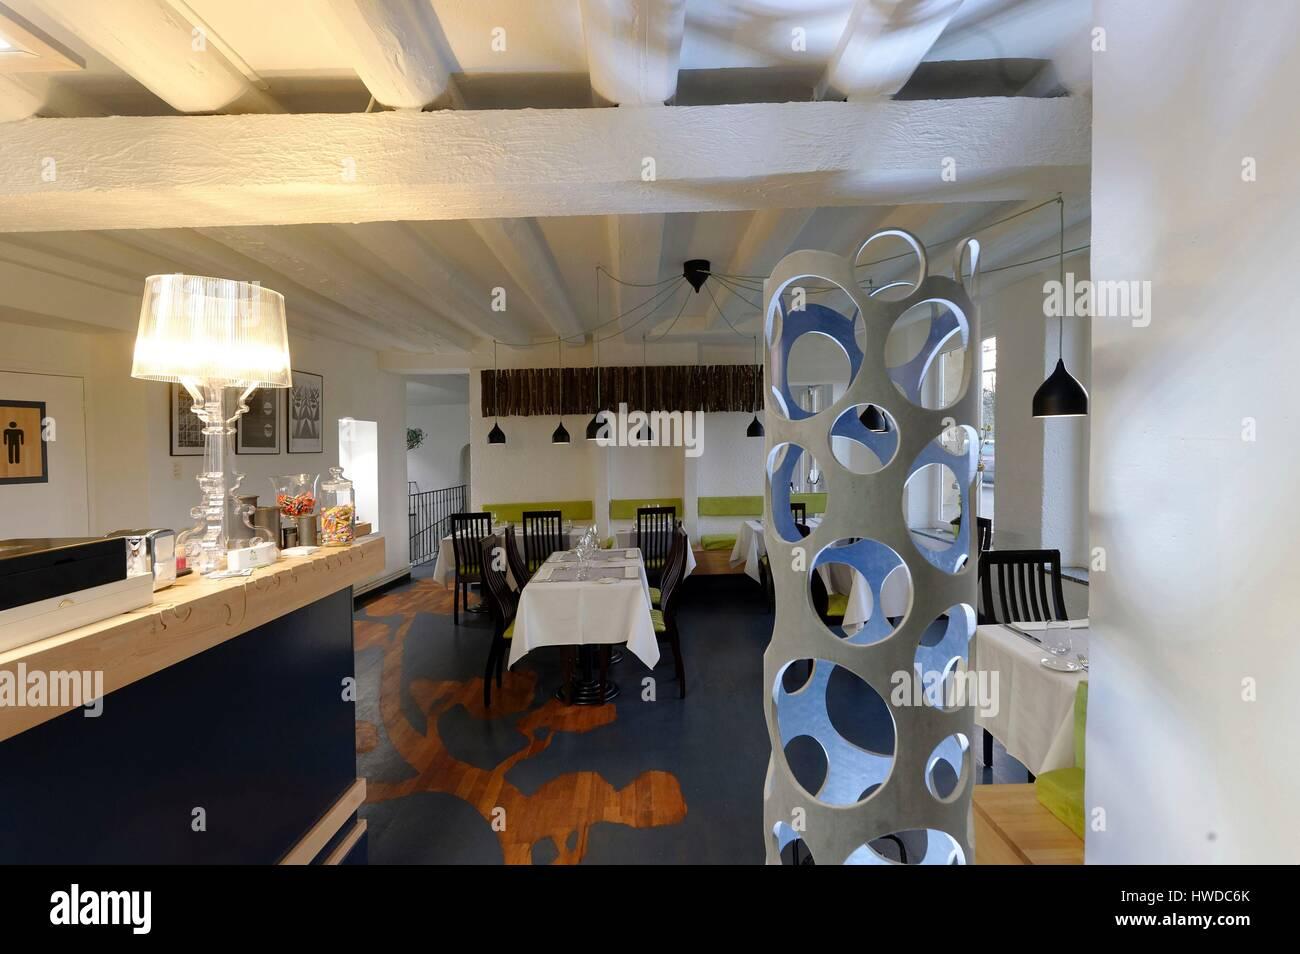 le quai restaurant stock photos le quai restaurant stock images alamy. Black Bedroom Furniture Sets. Home Design Ideas